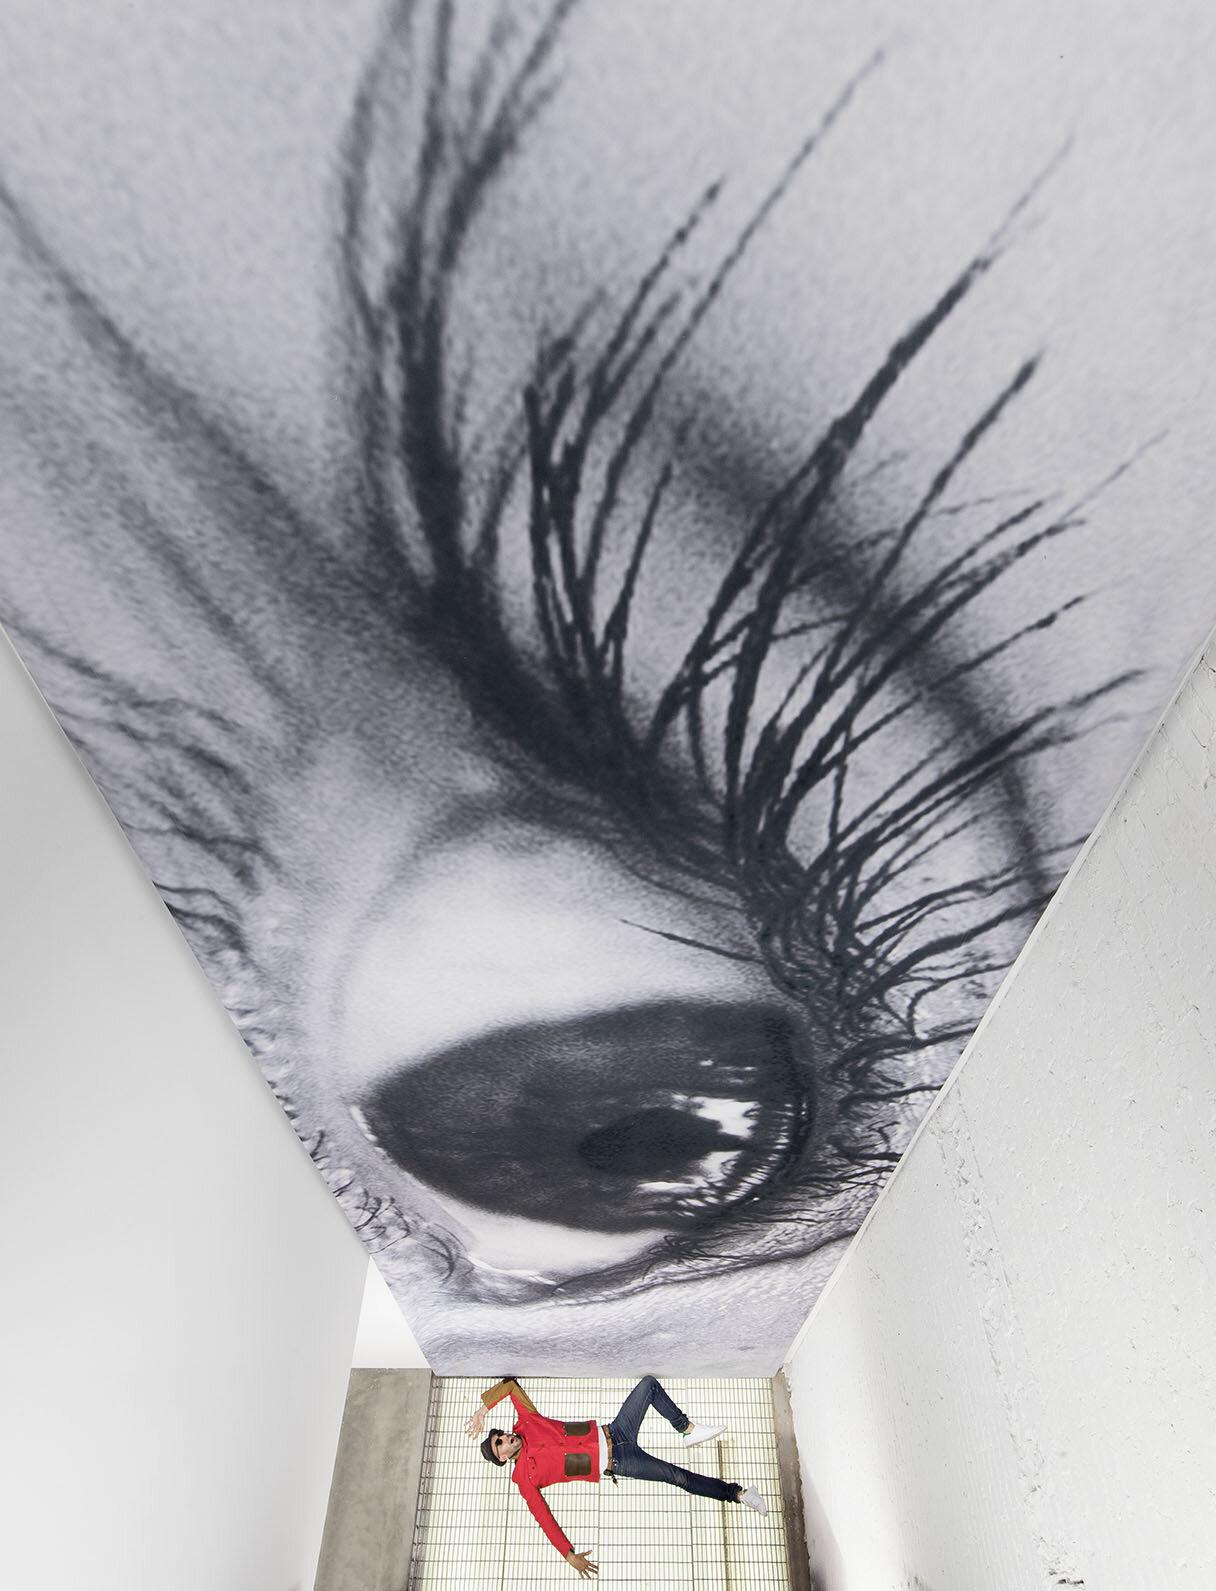 jr-artist-new-york-perrotin-brooklyn-museum-guillaume-ziccarelli-03.jpg